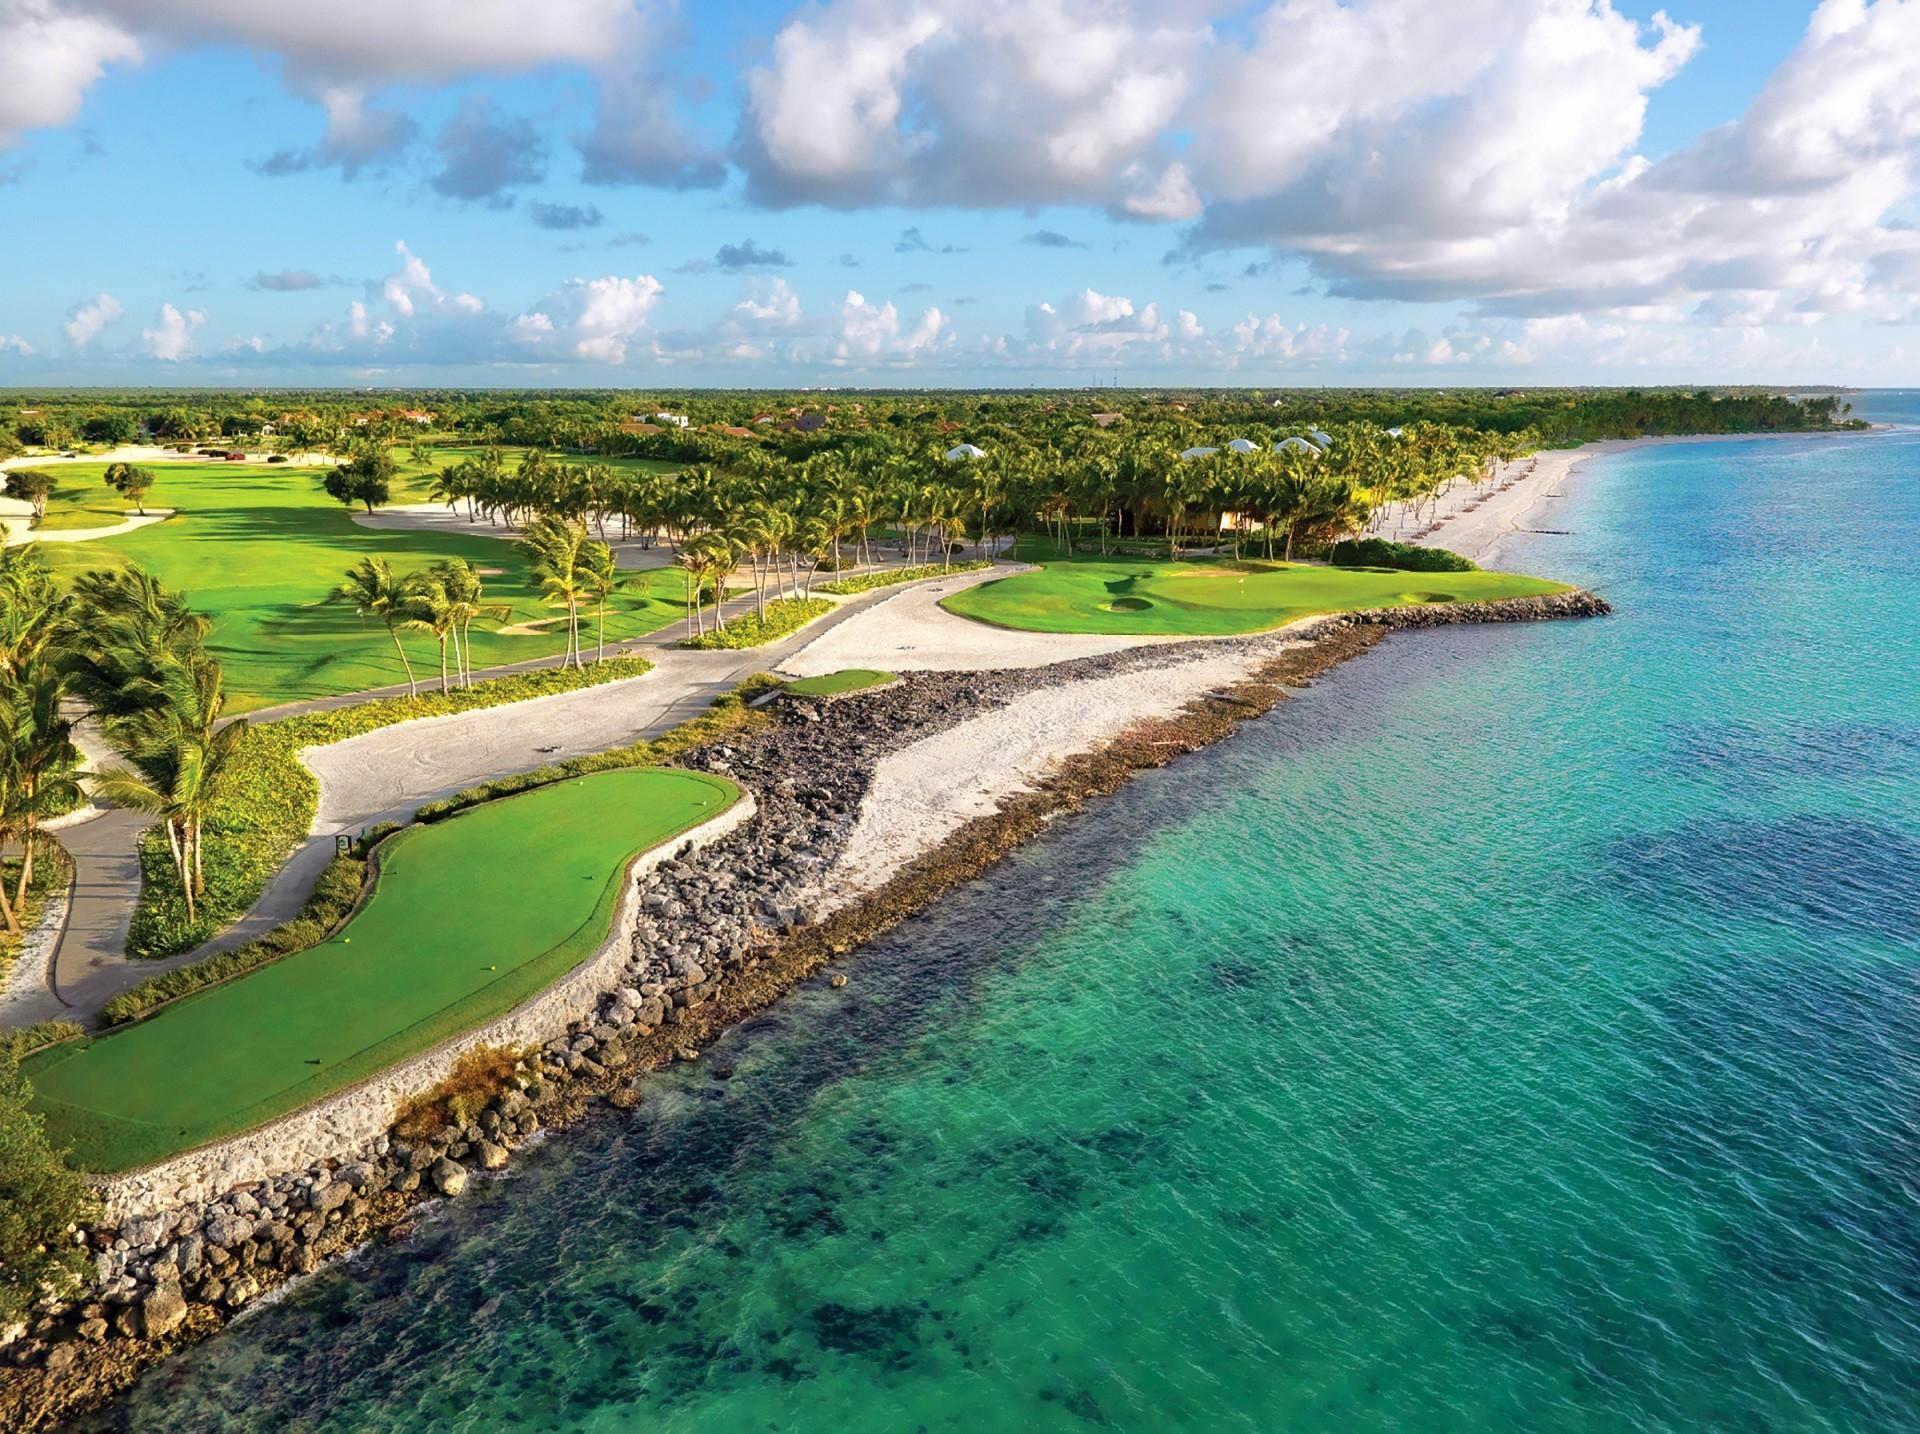 La Cana Golf And Beach Club Punta Cana